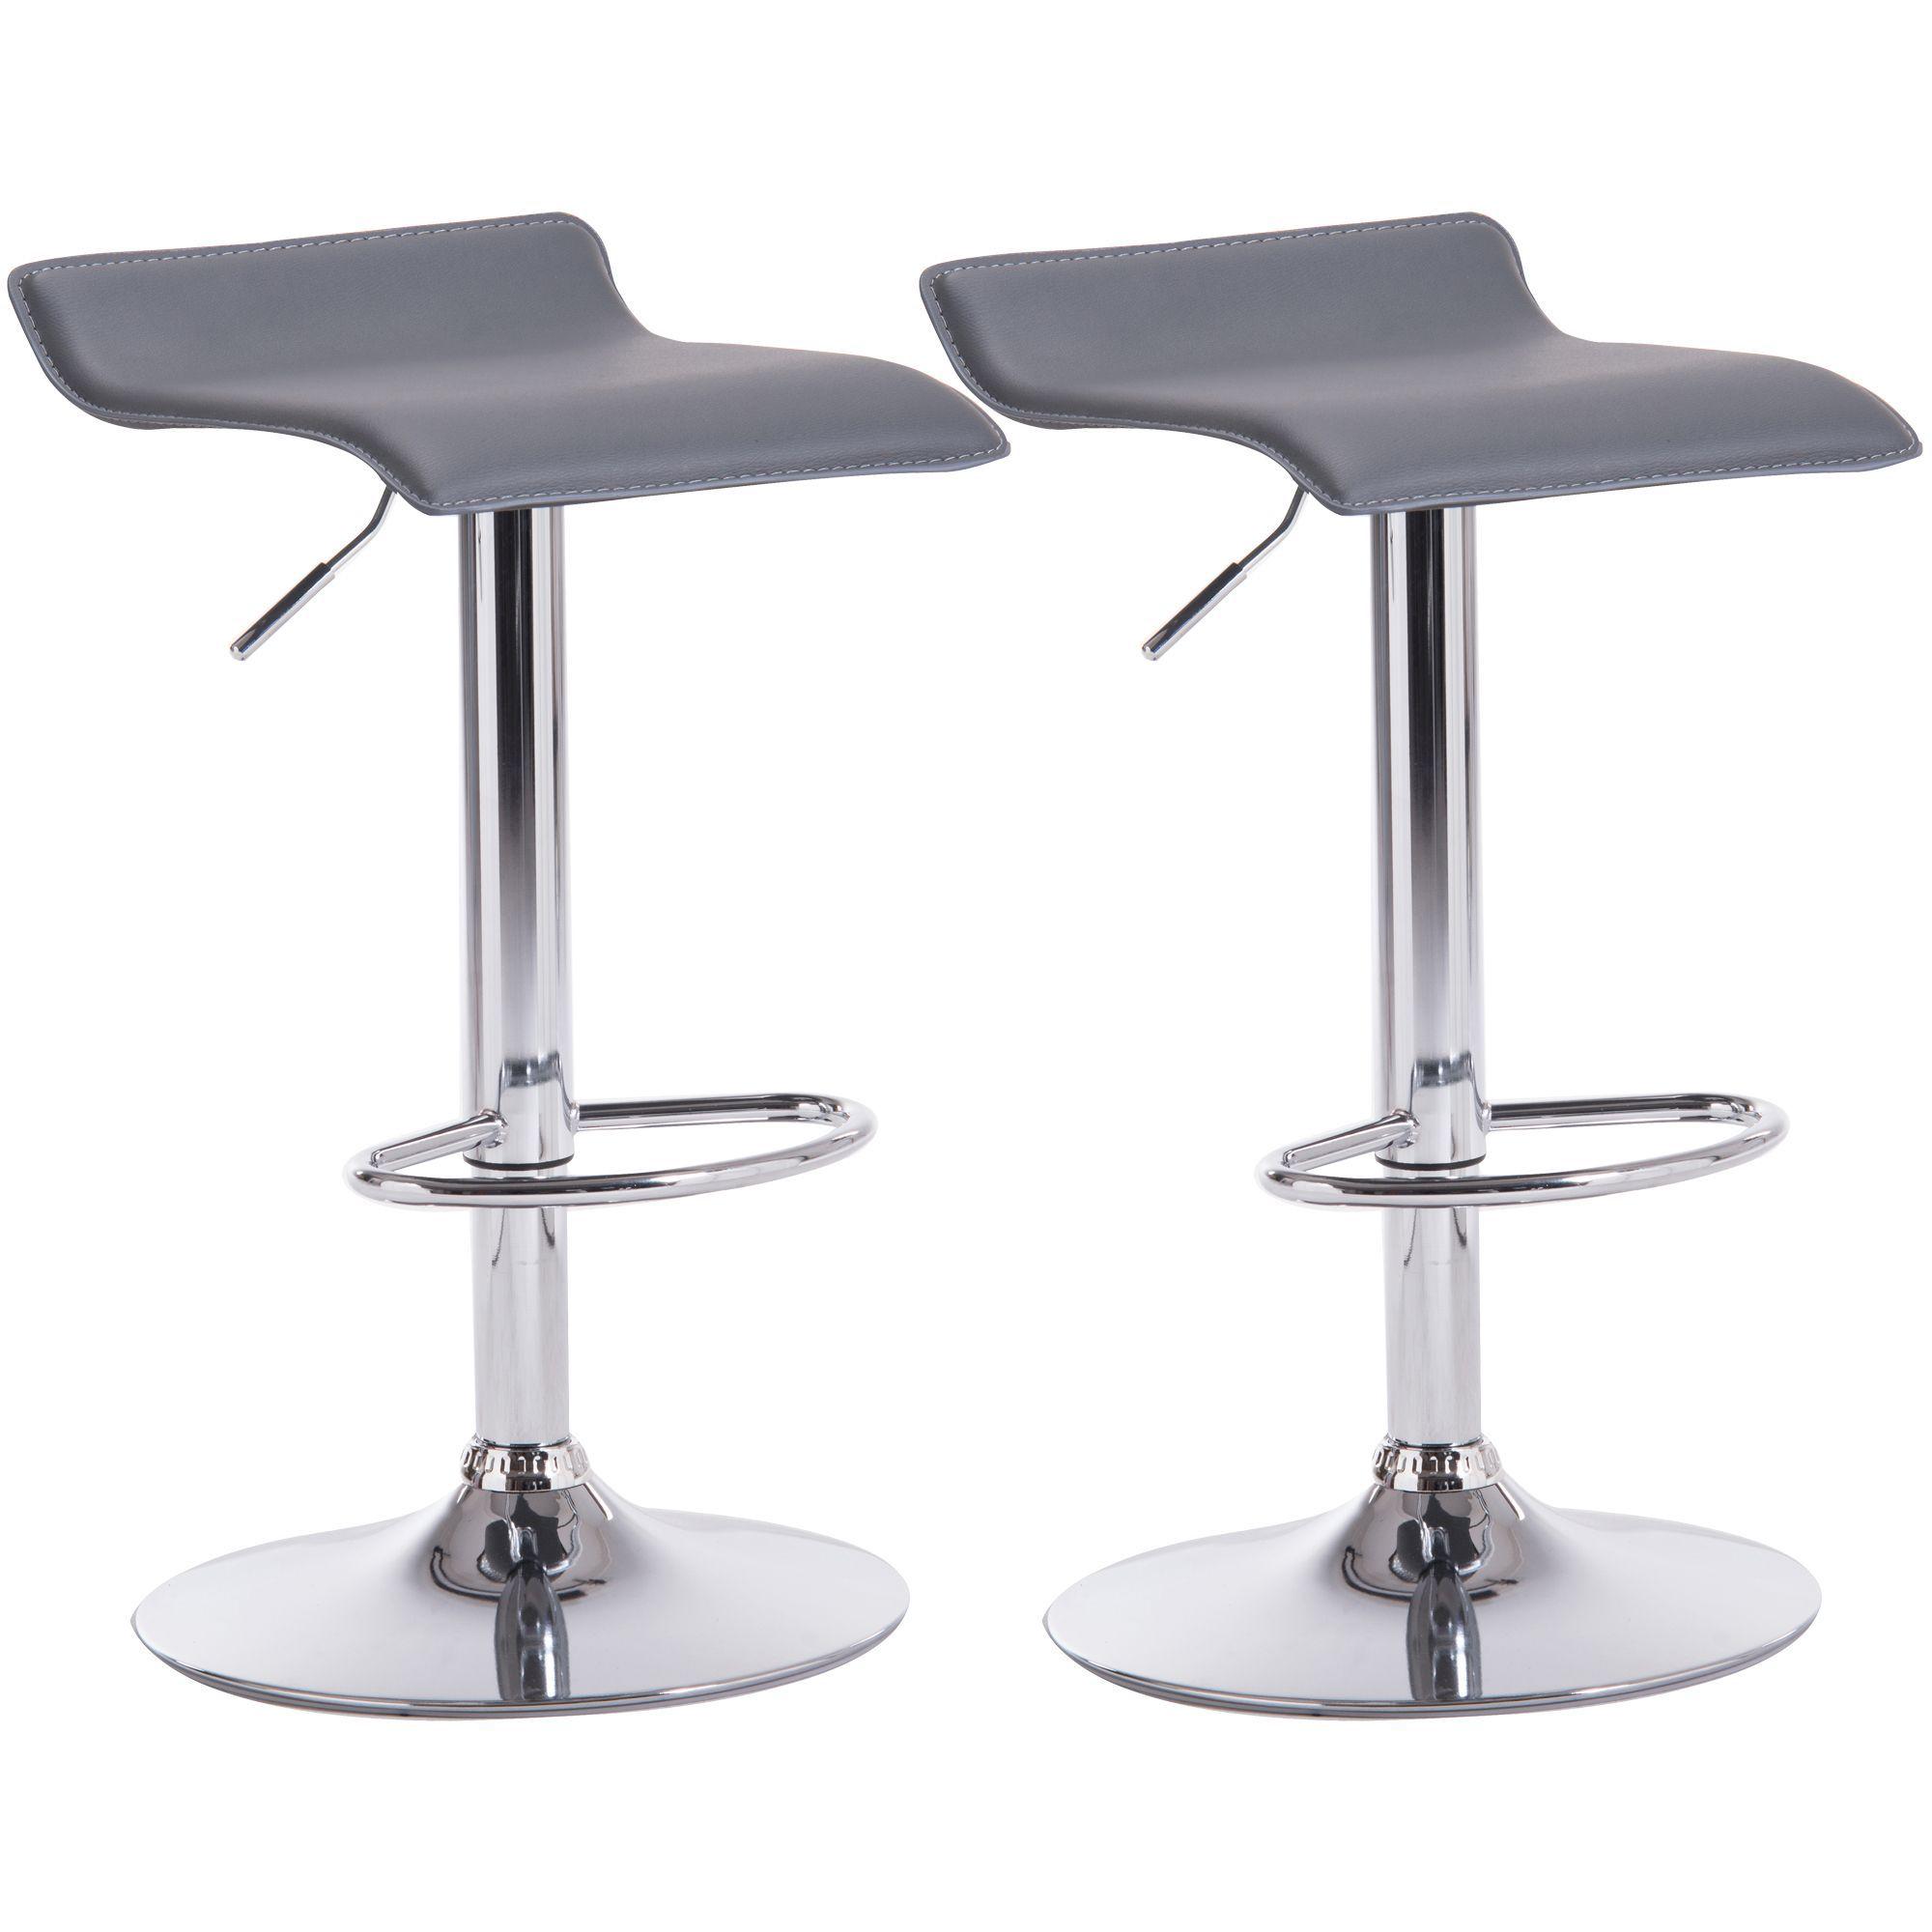 quality design e1833 85319 Daphne Grey & Chrome effect Bar stool (H)850mm (W)450mm, Pack of 2    Departments   DIY at B&Q